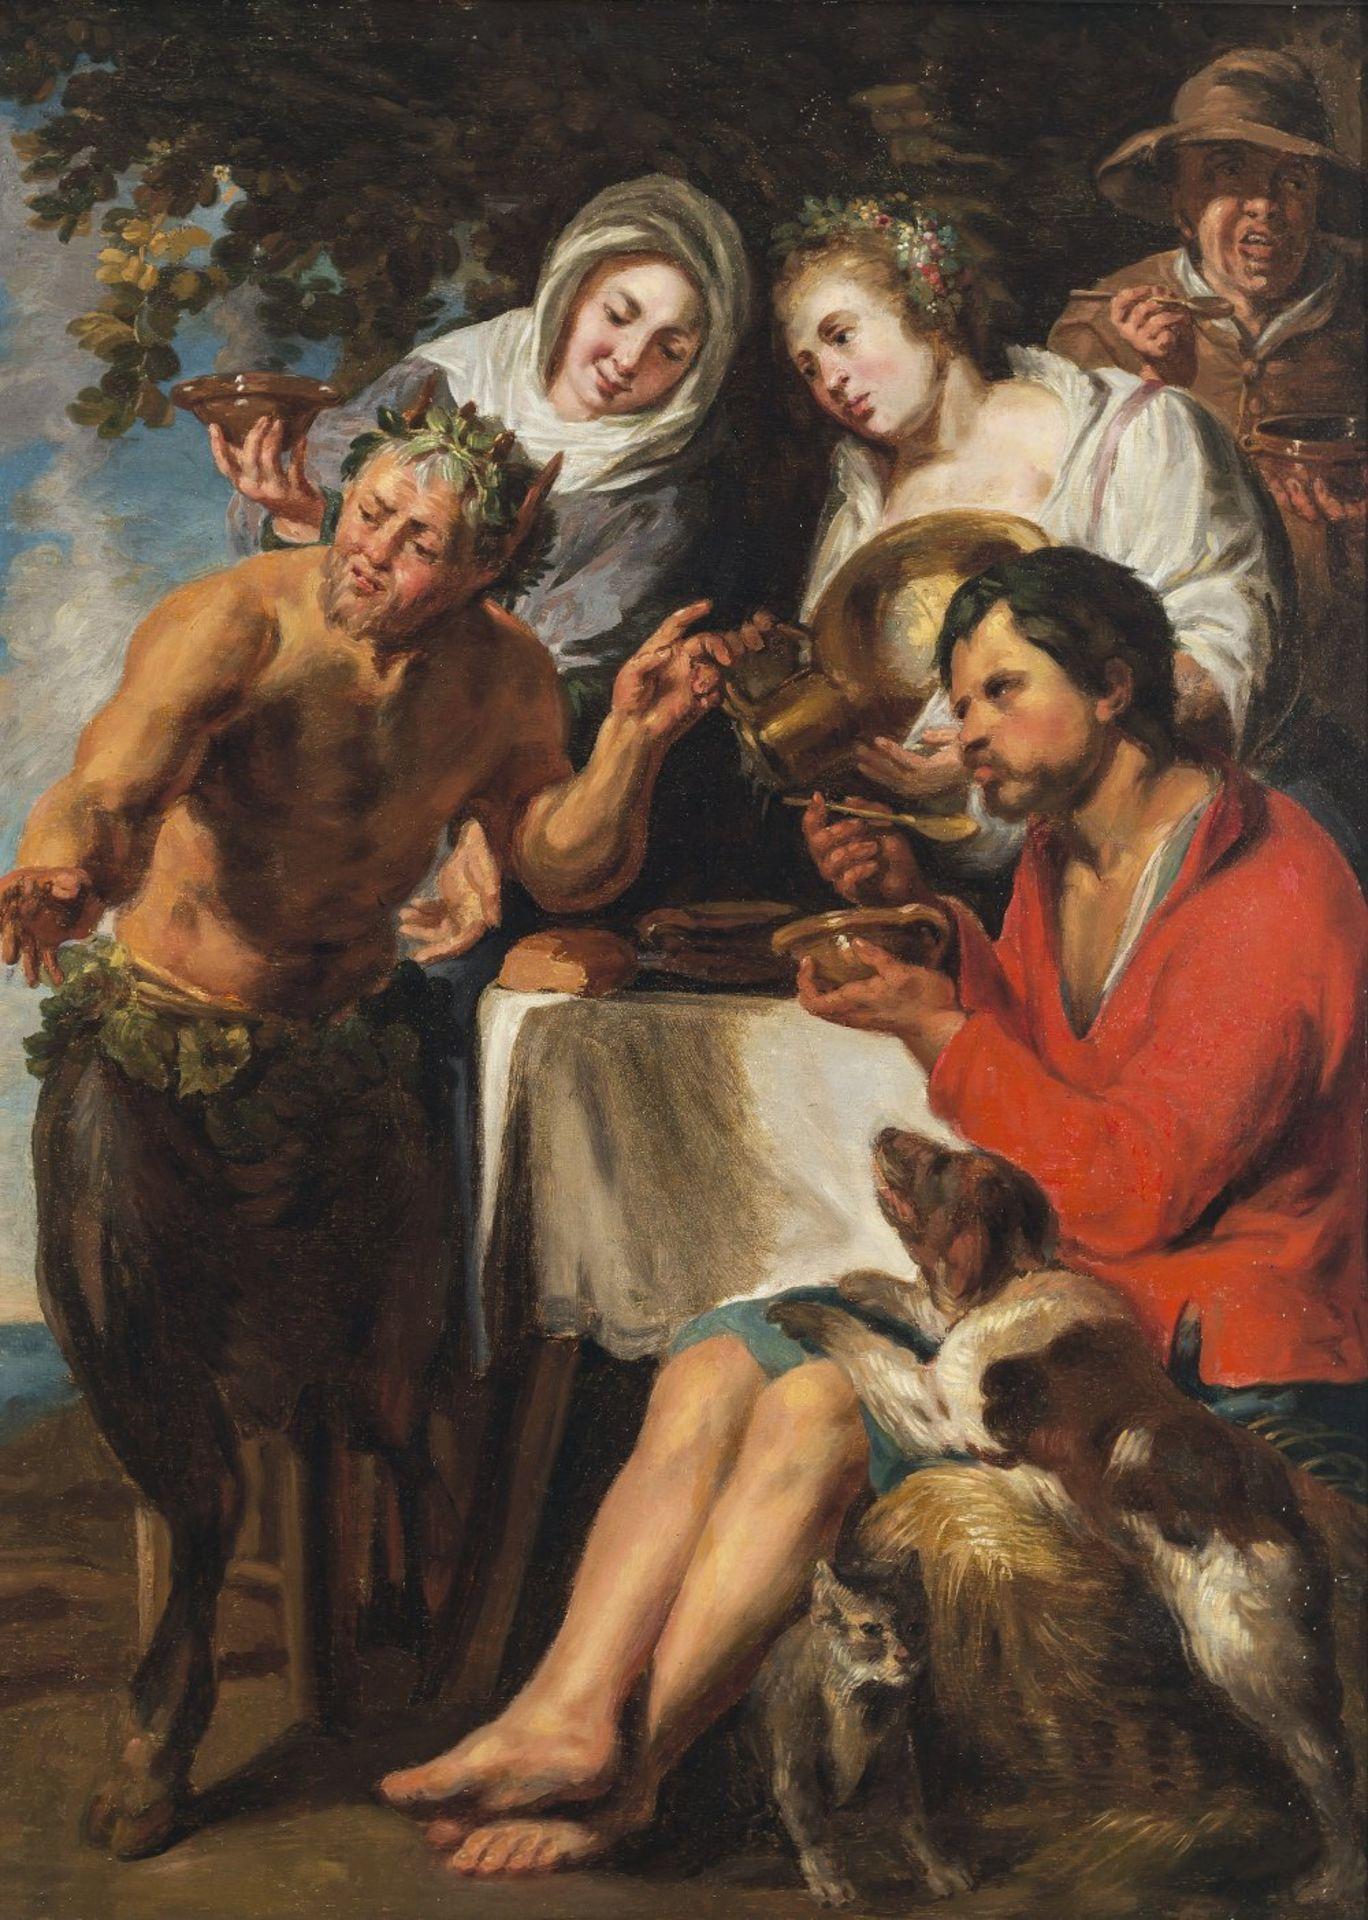 Jordaens, Jacob, UmkreisDer Satyr bei Bauern. Öl/Holz. 71 x 50 cm. Rest., parkettiert. Unsign.Circle